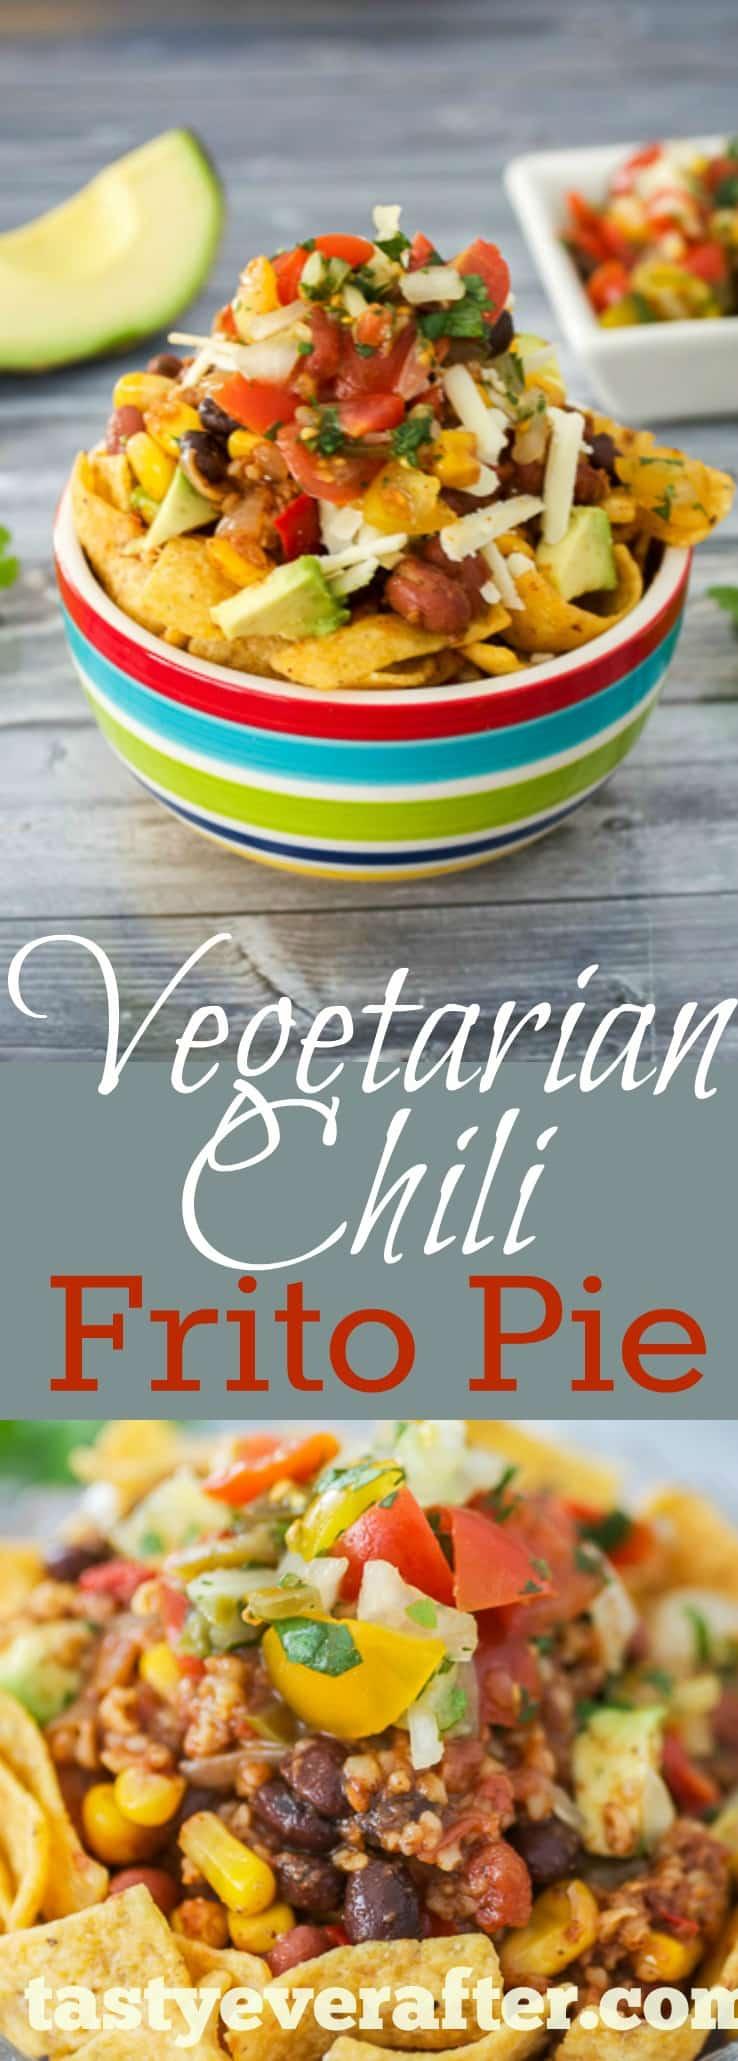 Vegetarian Chili Frito Pie